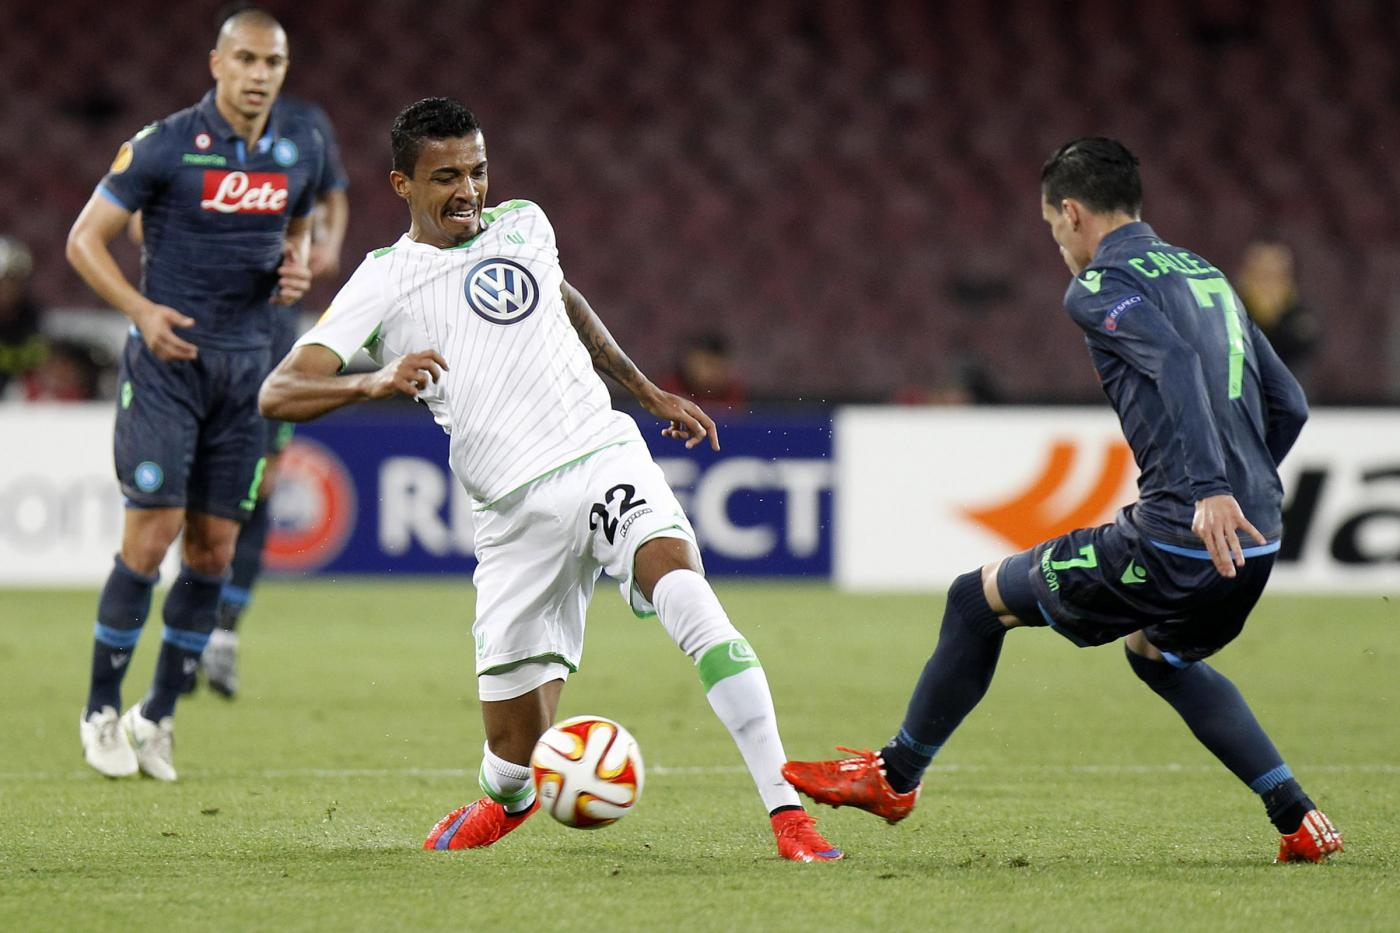 Calciomercato Juventus, da Luiz Gustavo a Kolasinac: Marotta prova lo sprint finale